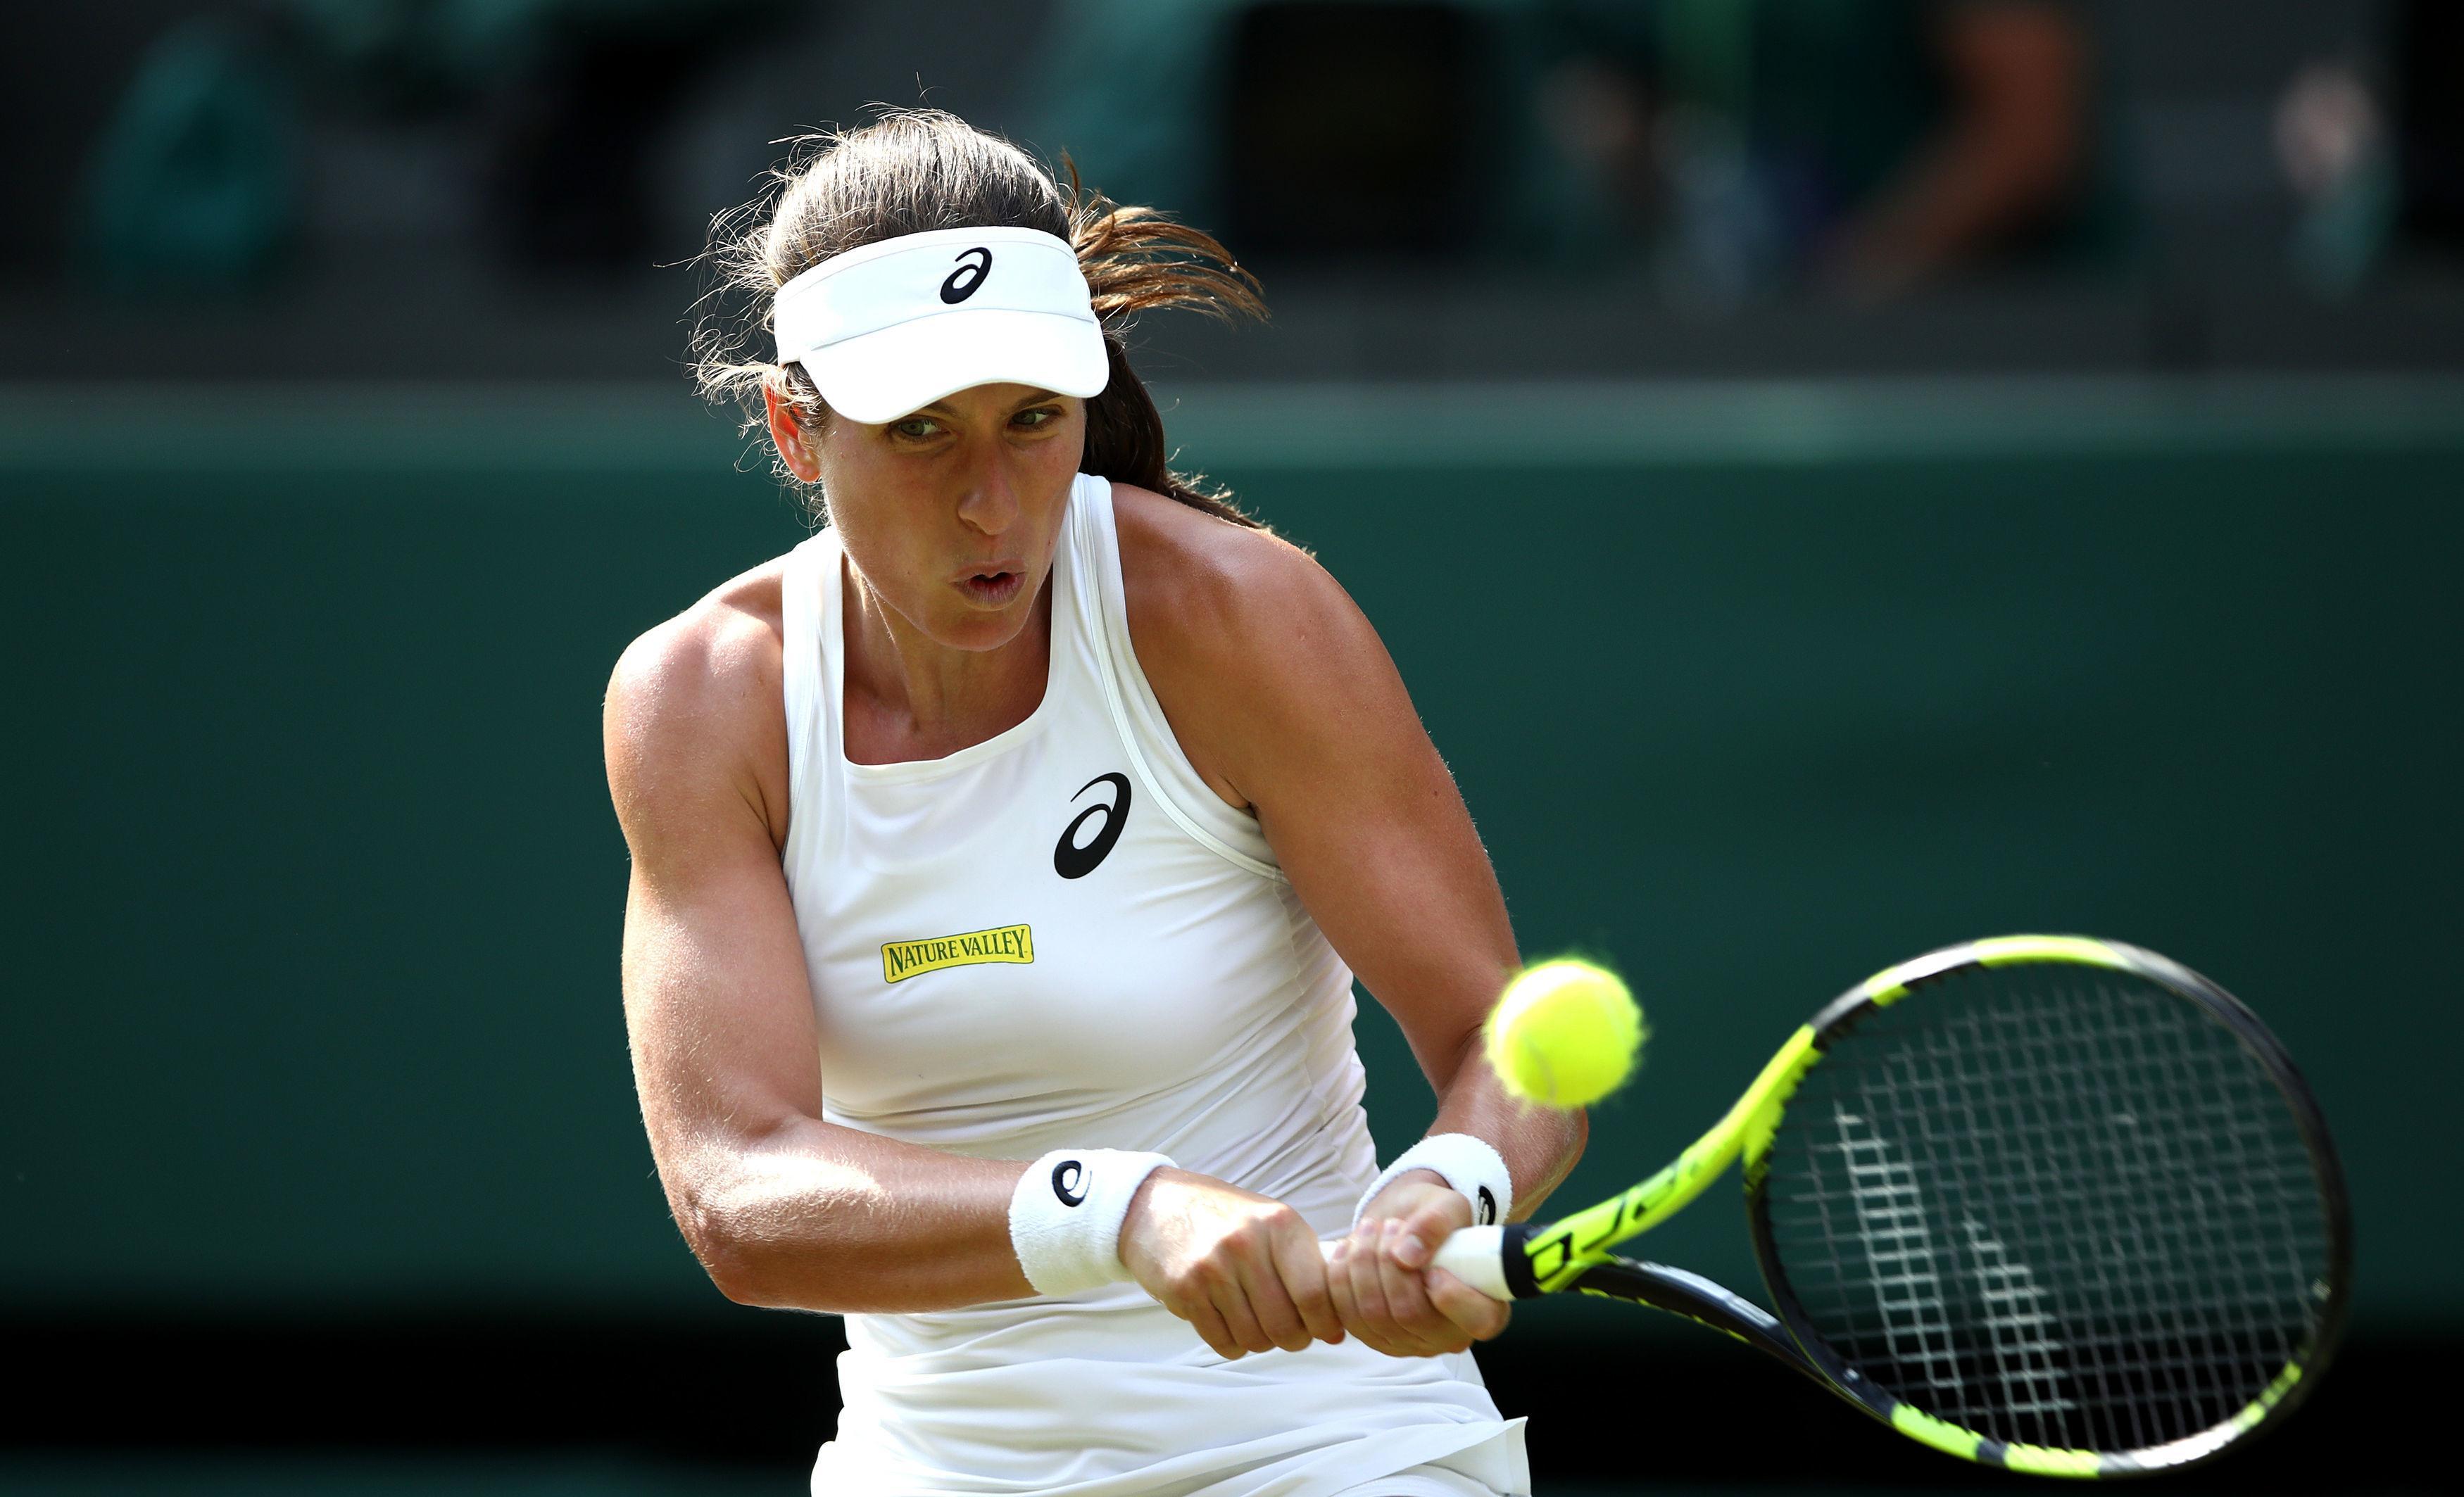 Jo Konta was seeded No22 at Wimbledon but crashed out toDominika Cibulkova